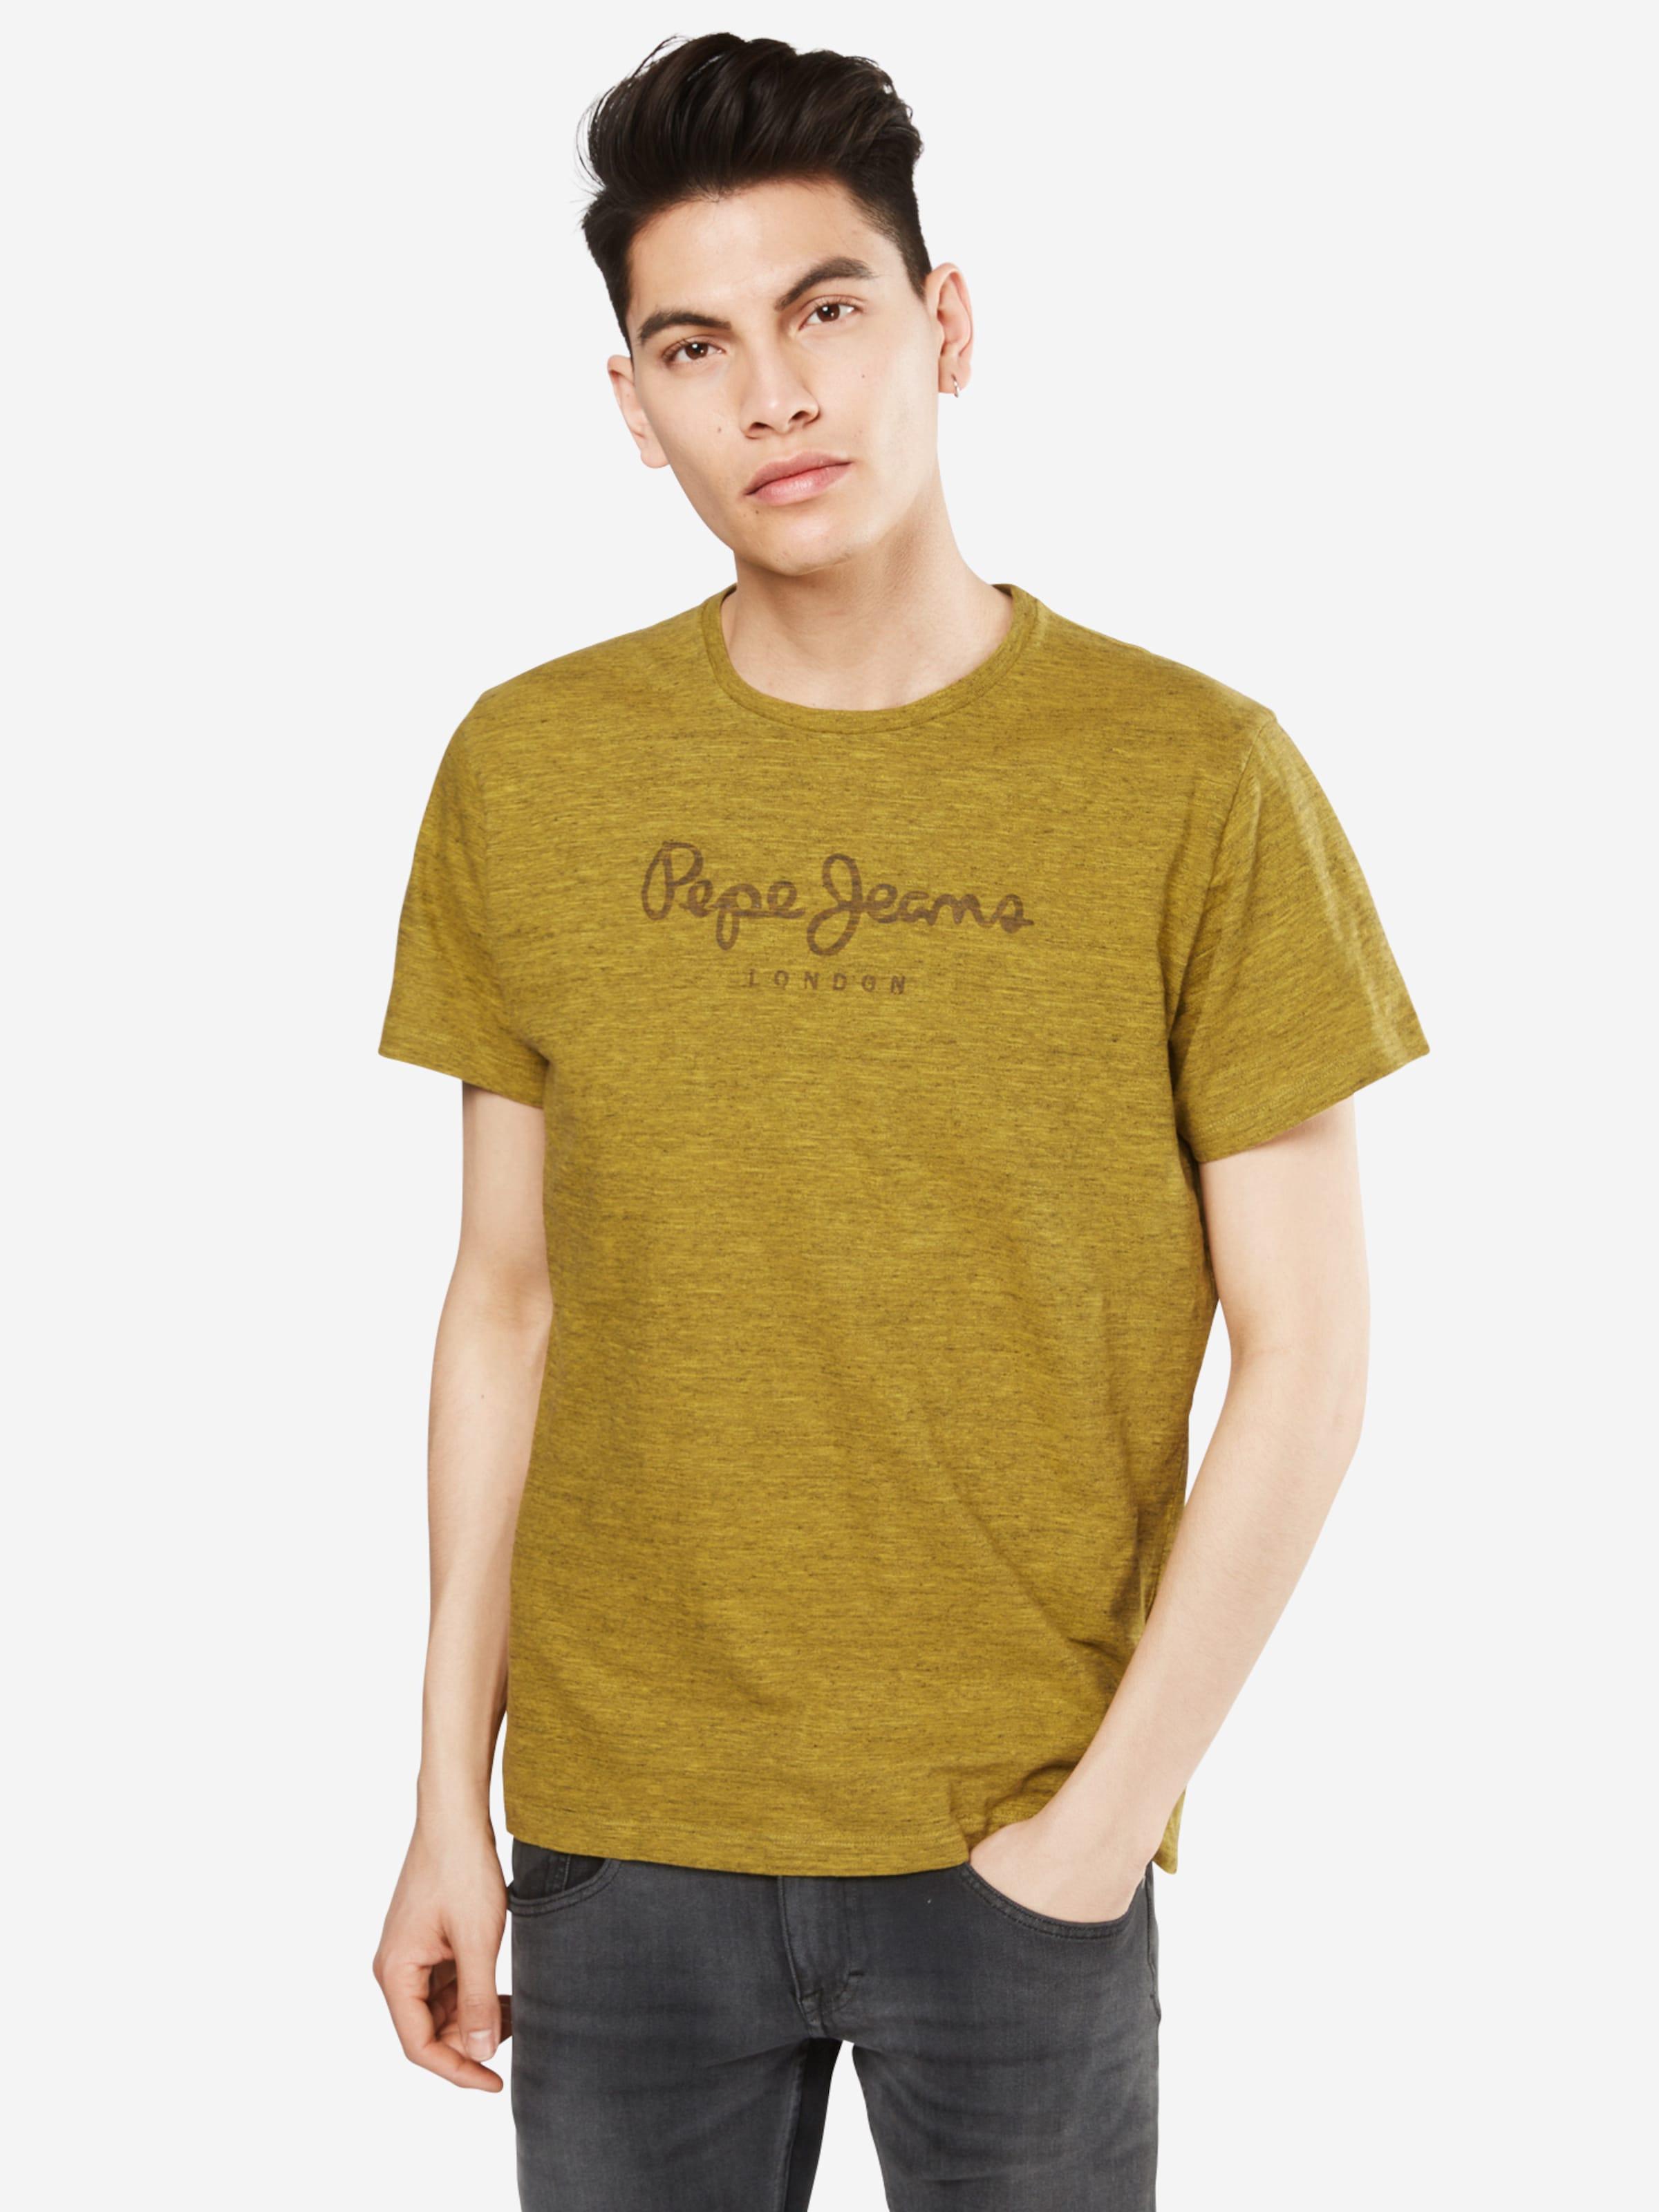 Pepe Jeans T-Shirt 'HORST' Spielraum Niedrigsten Preis fbqOJy3sc